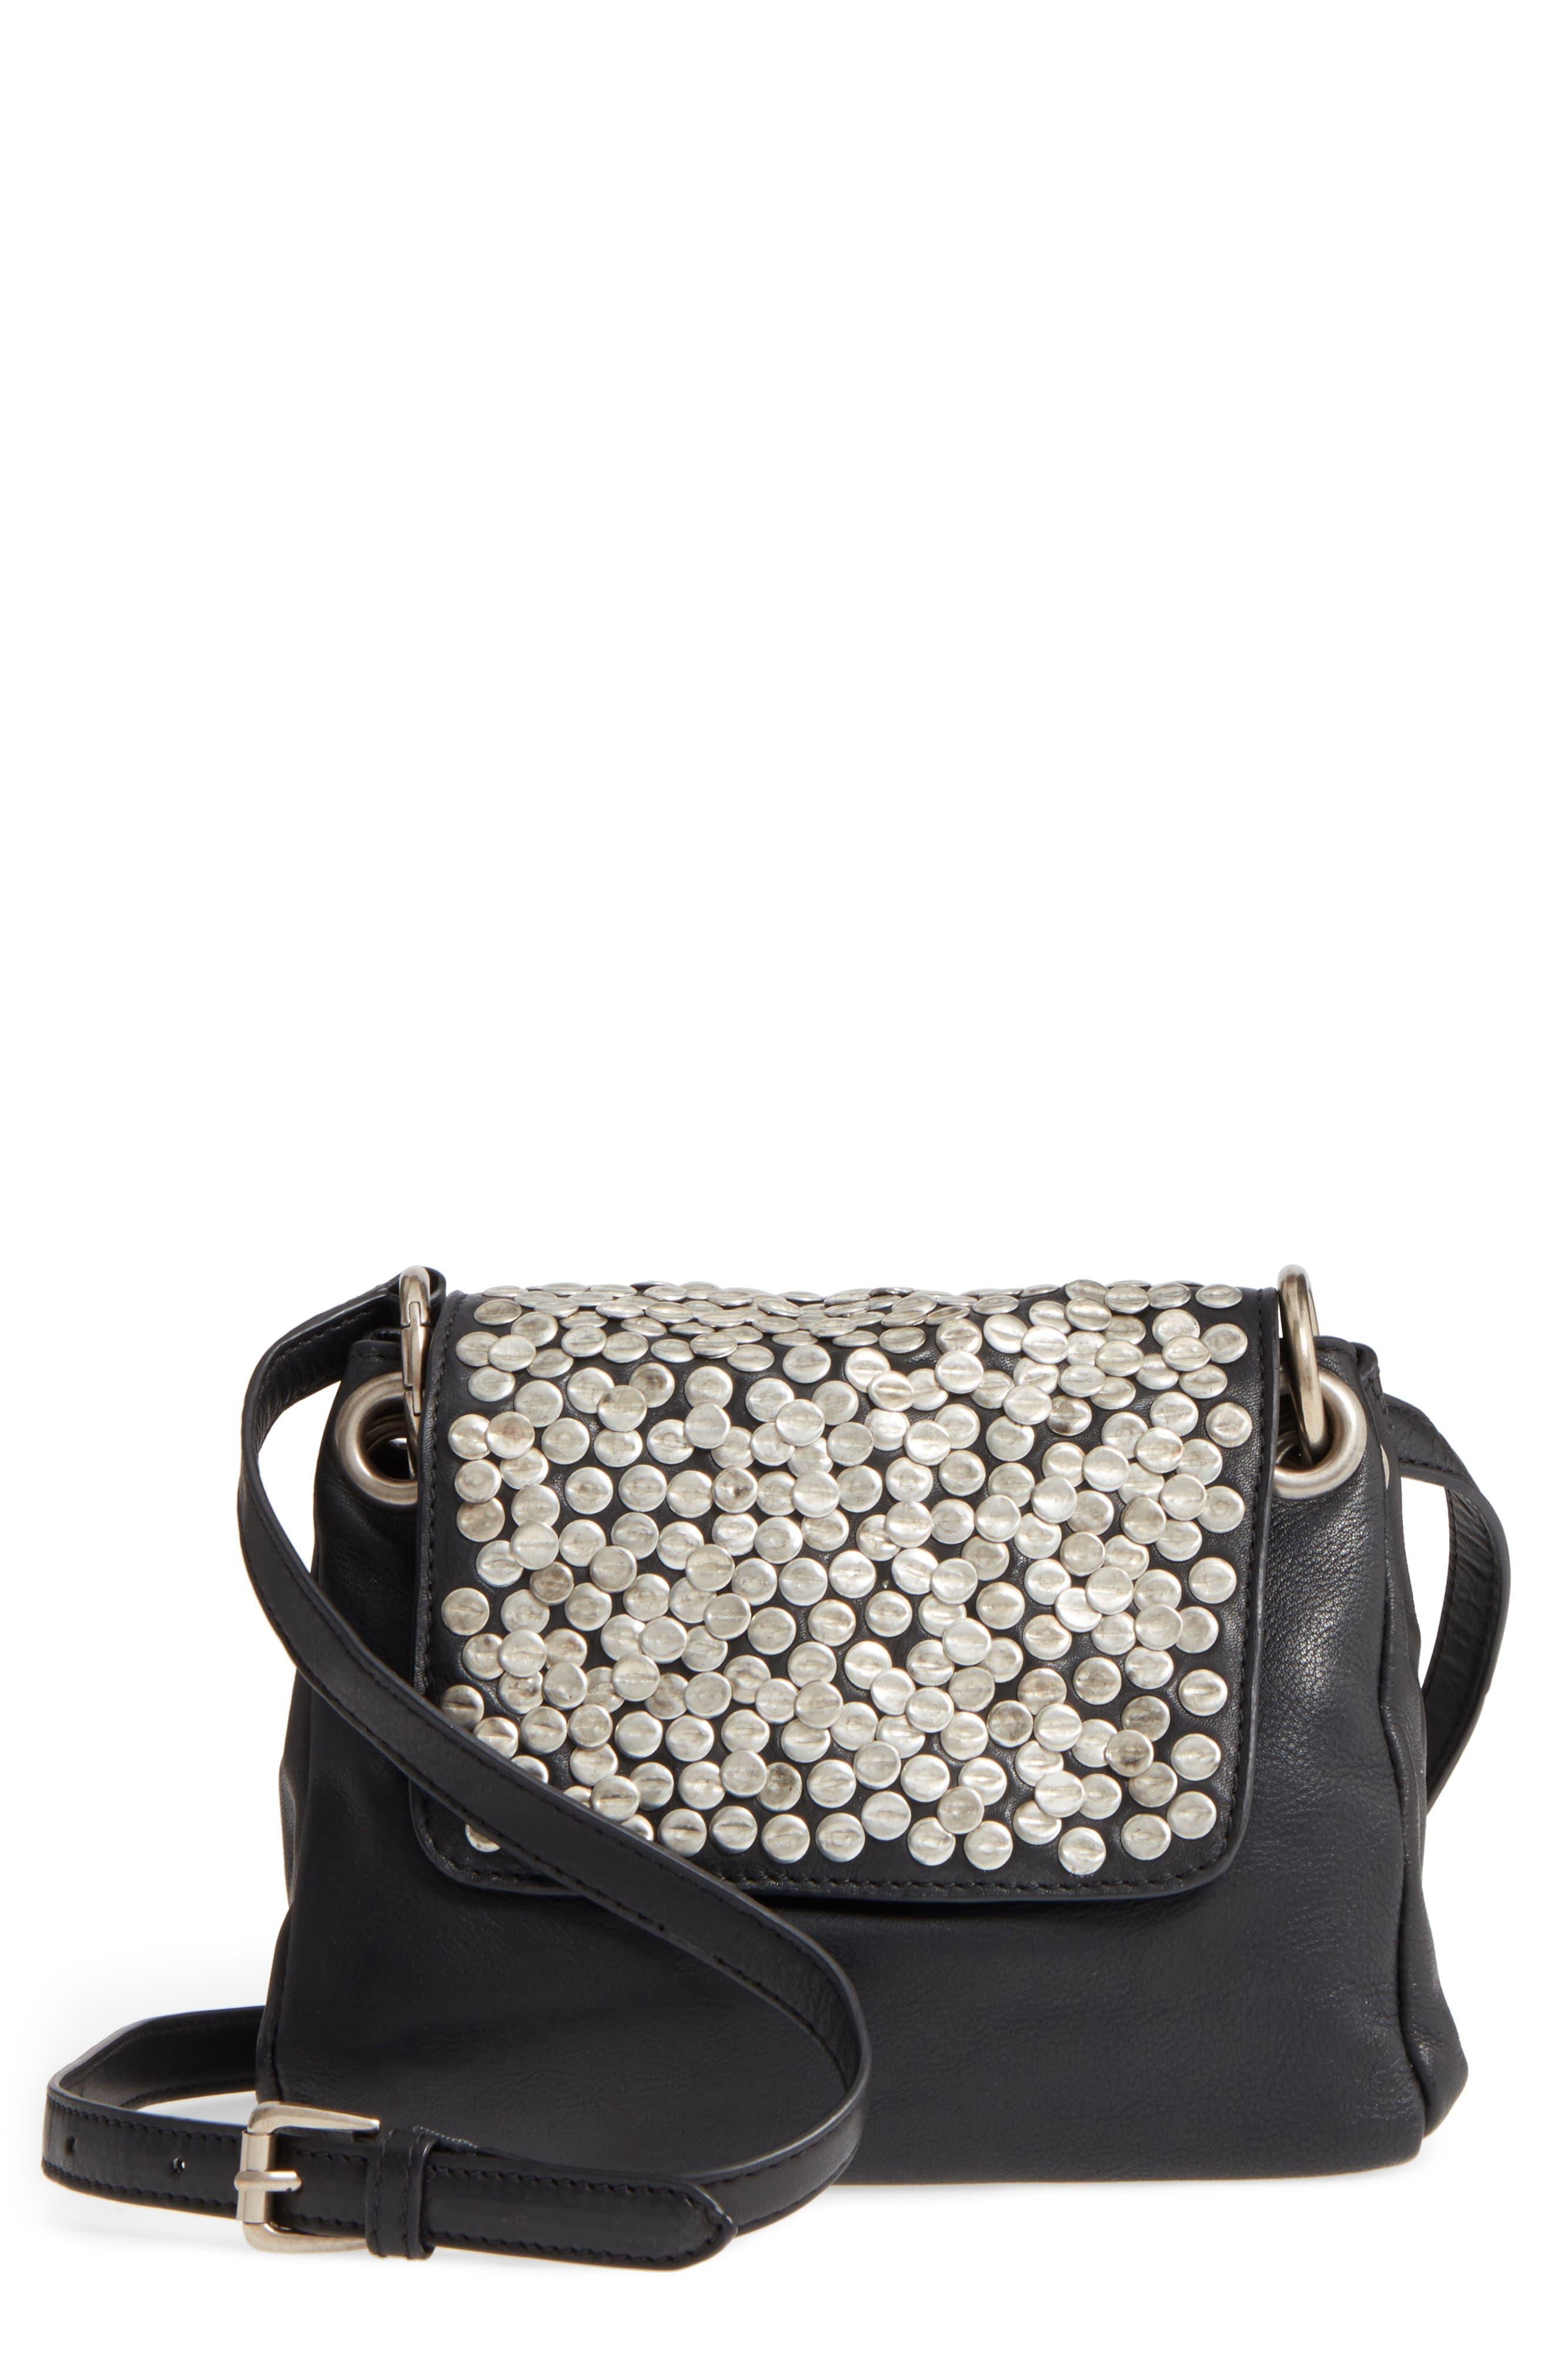 Céline Dion Cadence Crossbody Bag